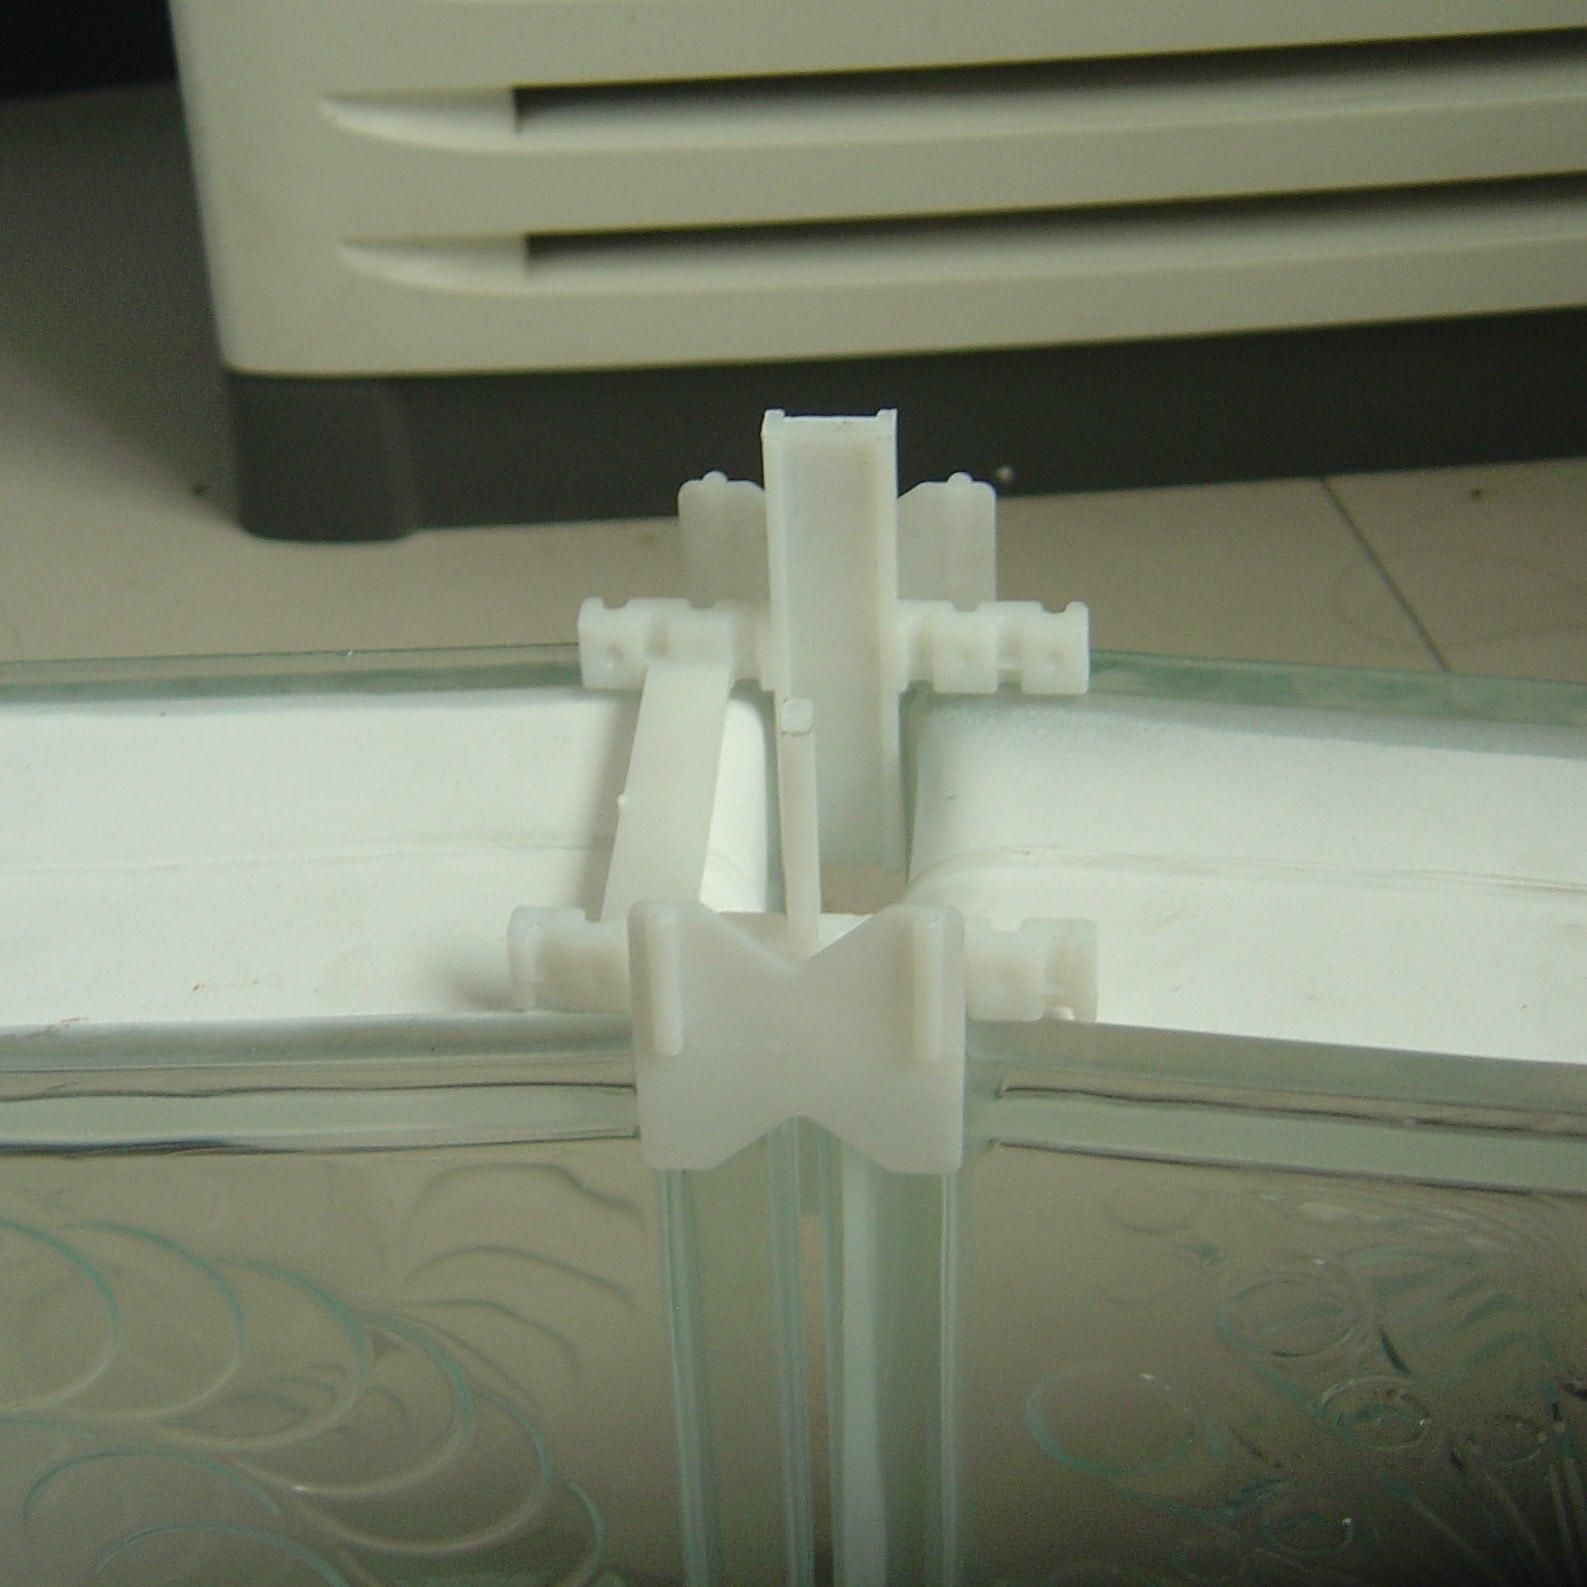 Bloco de vidro da parede da curva –Bloco de vidro da parede da curva  #565434 1587x1587 Banheiro Bloco De Vidro